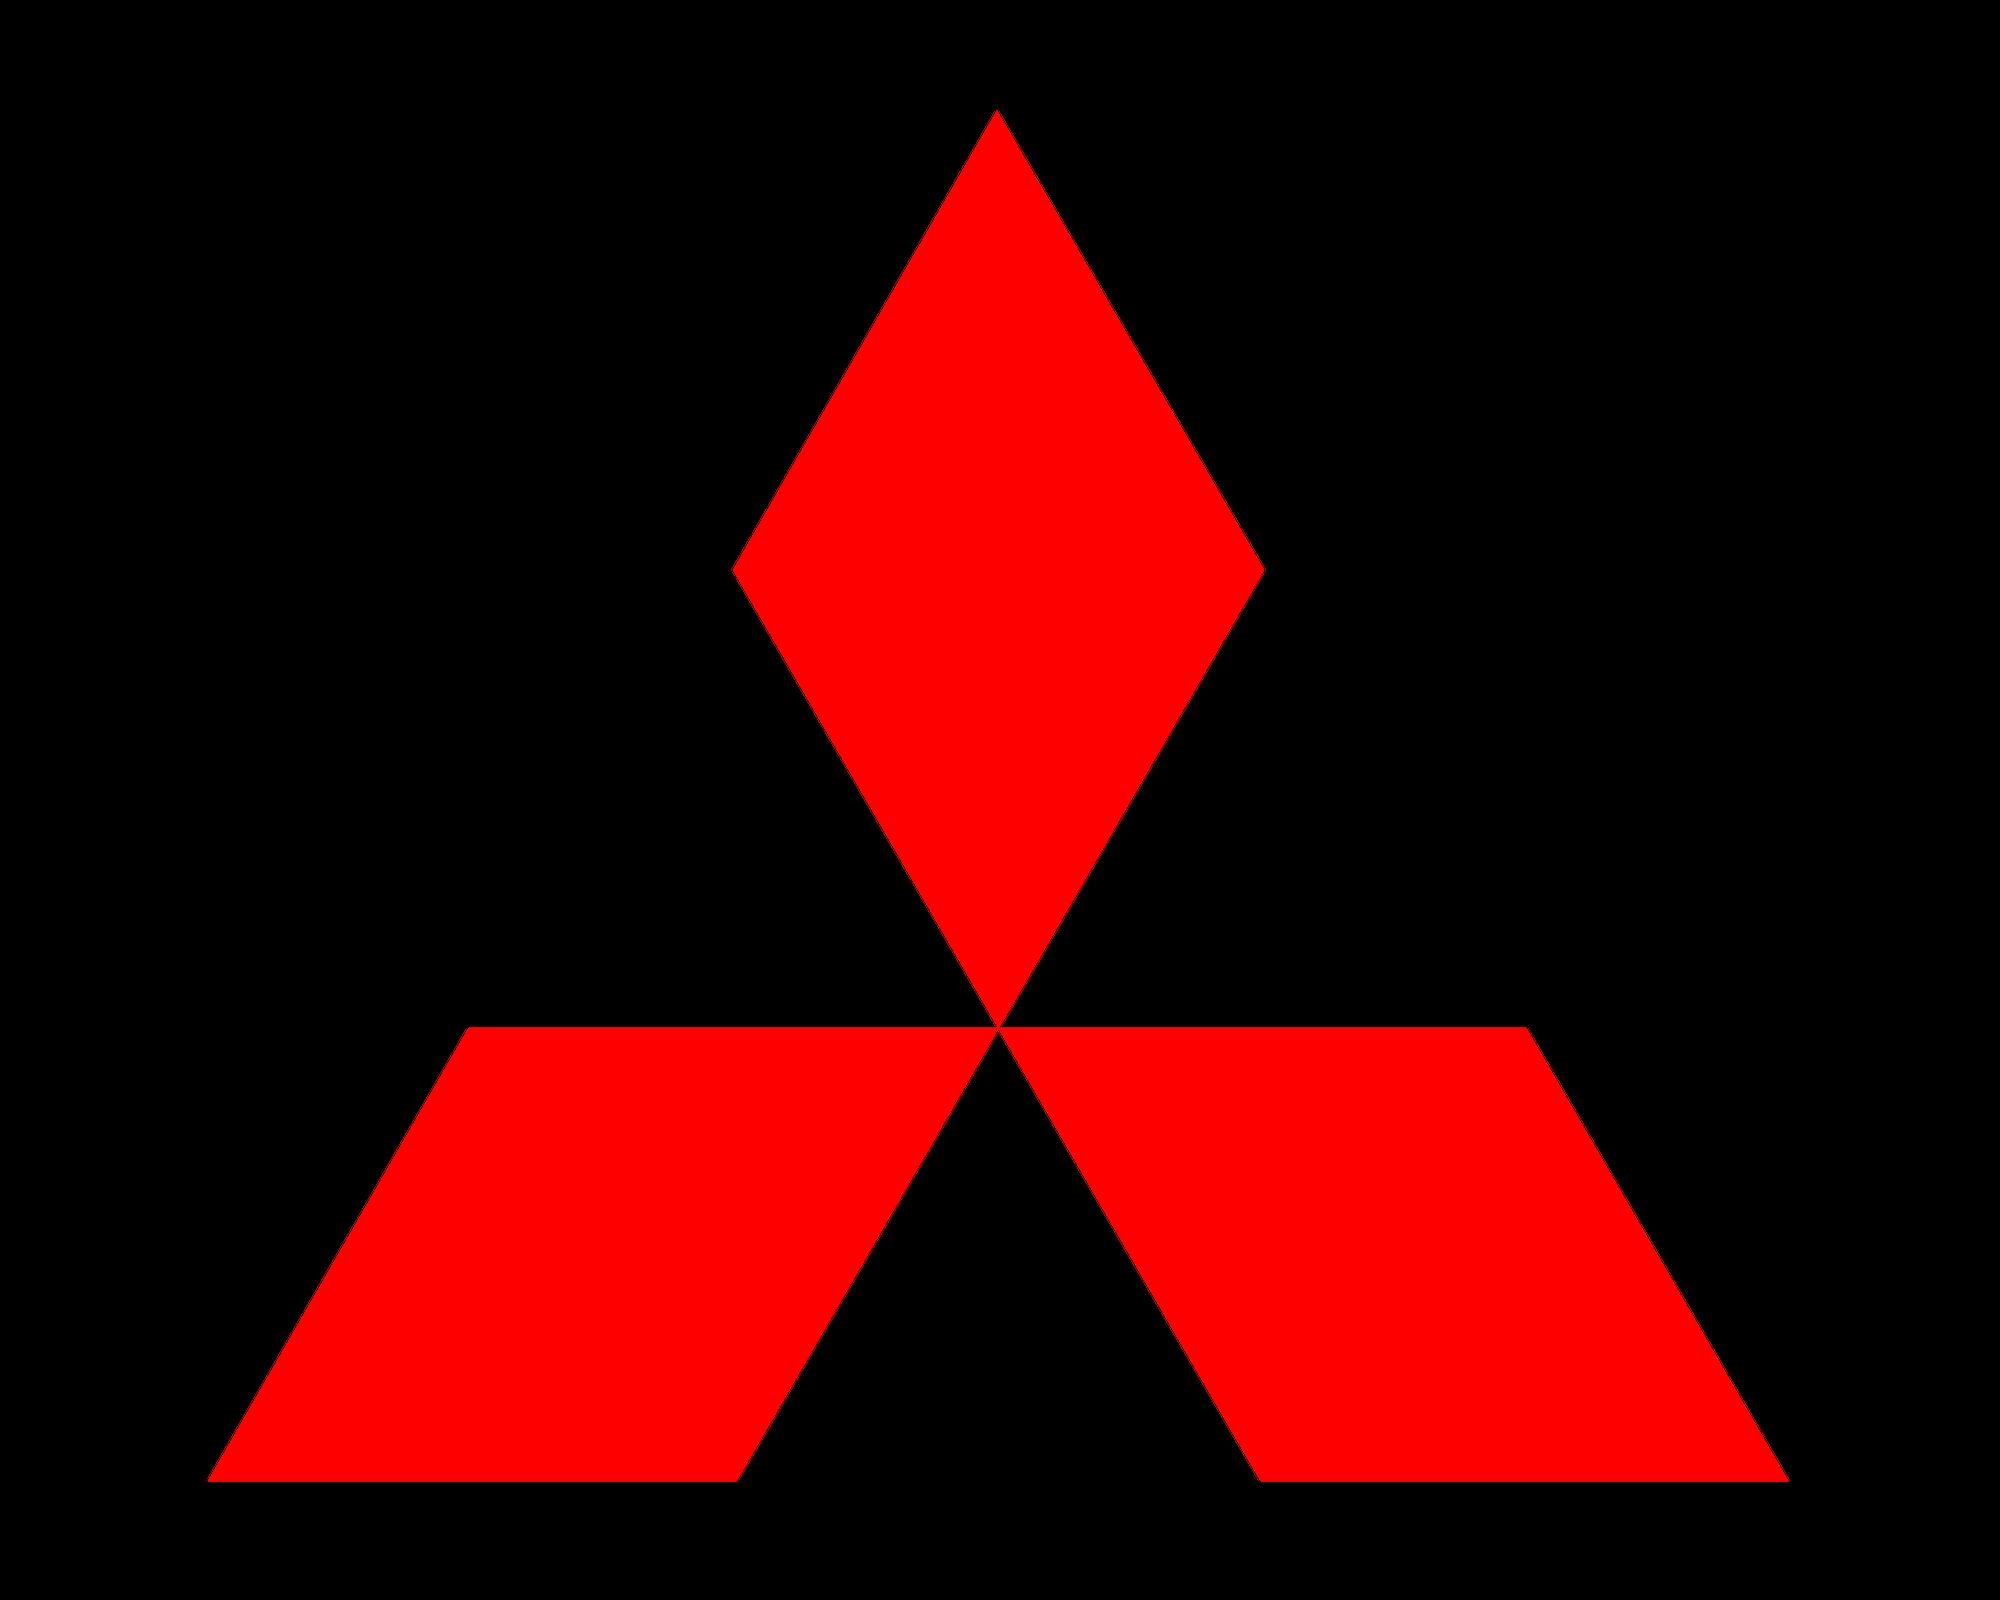 Mitsubishi Logo Mitsubishi Mitsubishi Cars Logos